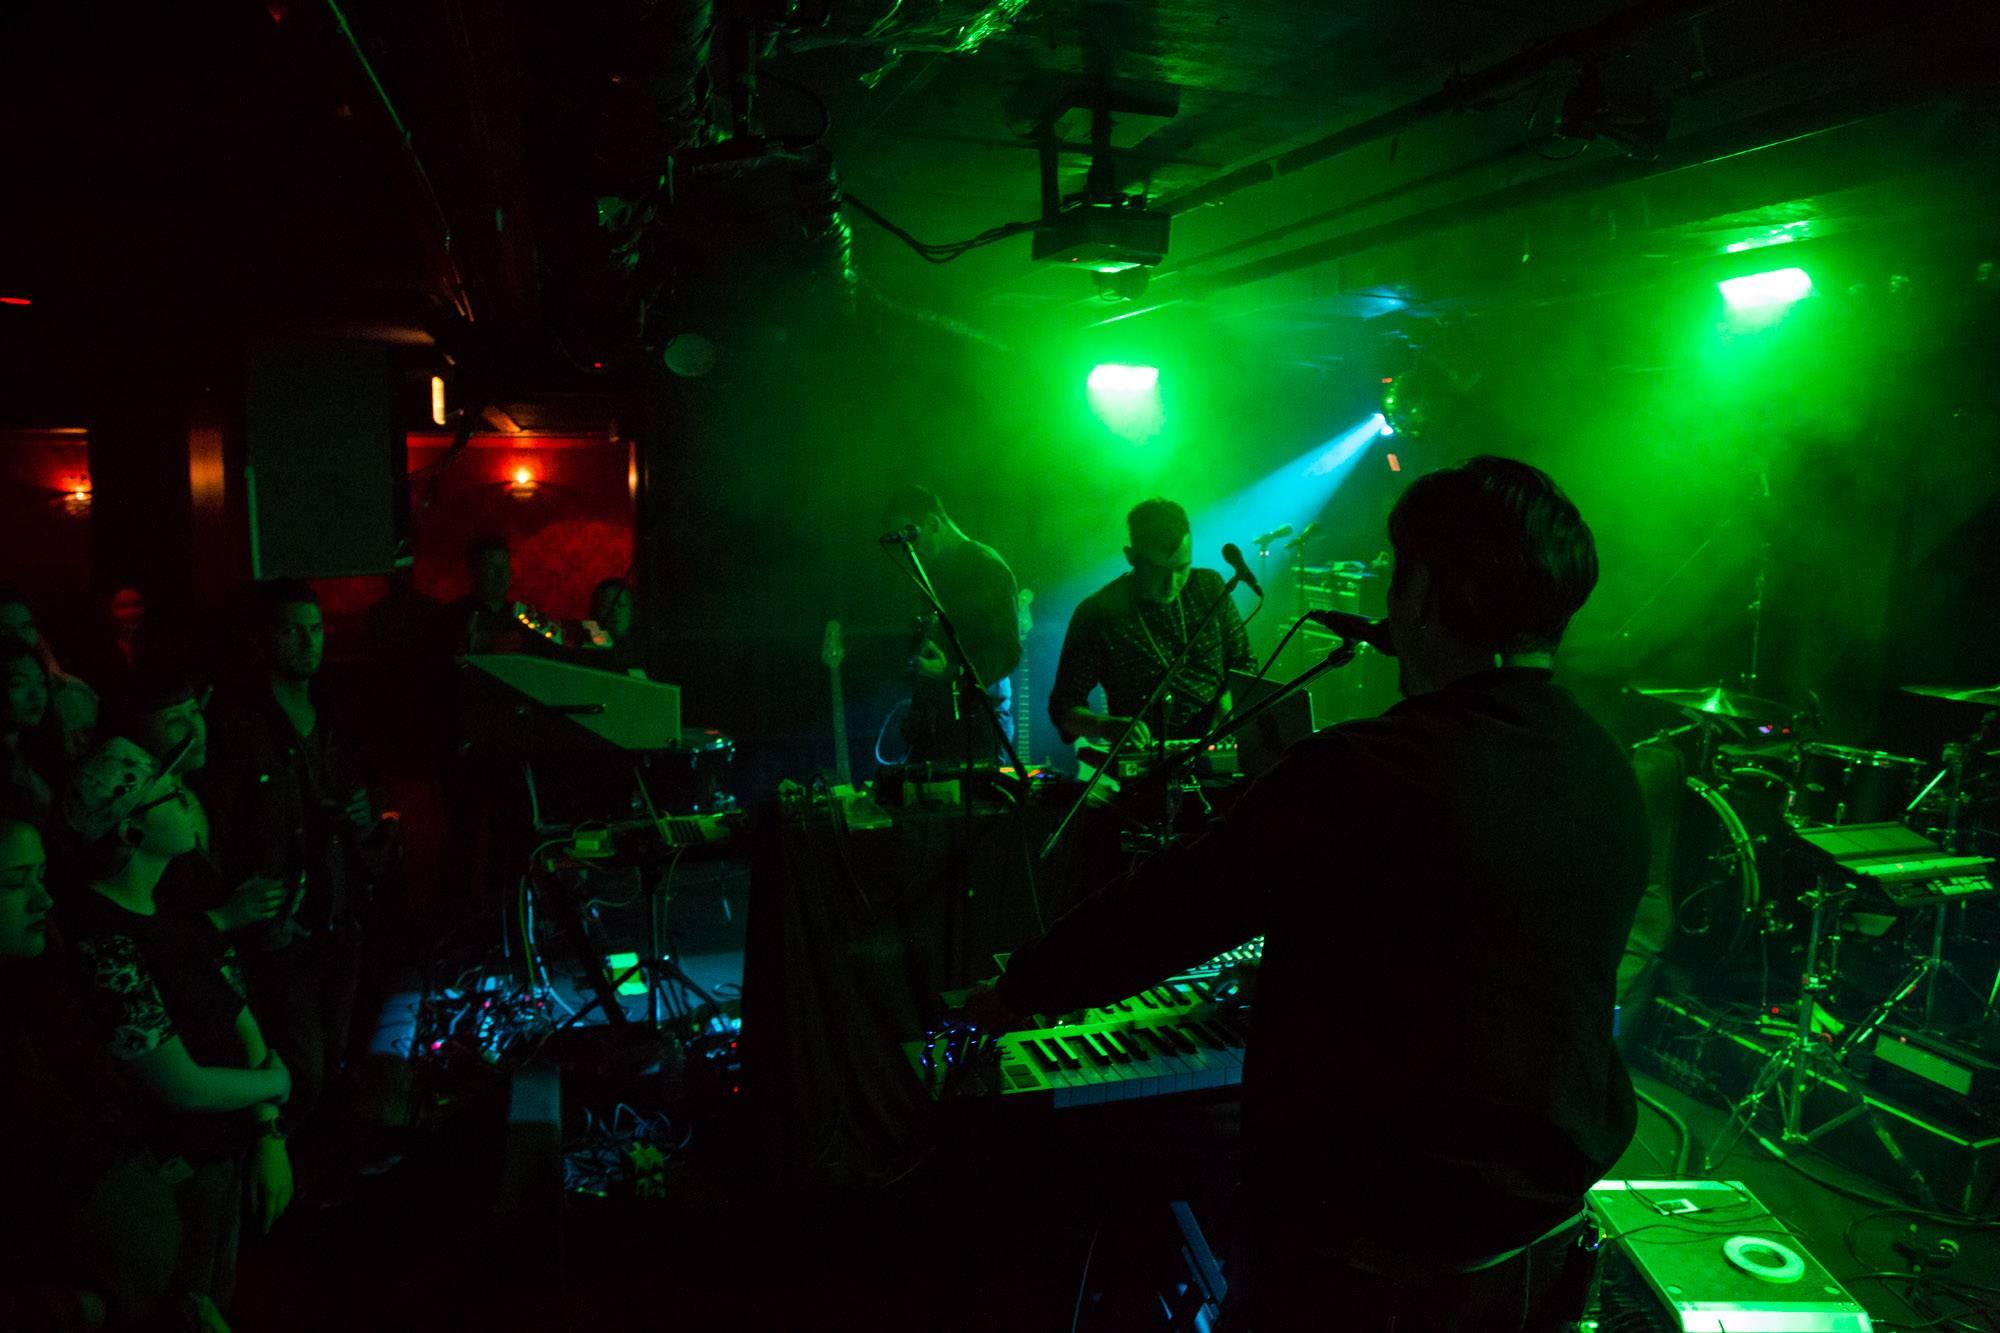 Low Roar at the Biltmore Cabaret, Vancouver, Apr. 20 2017. Kirk Chantraine photo.